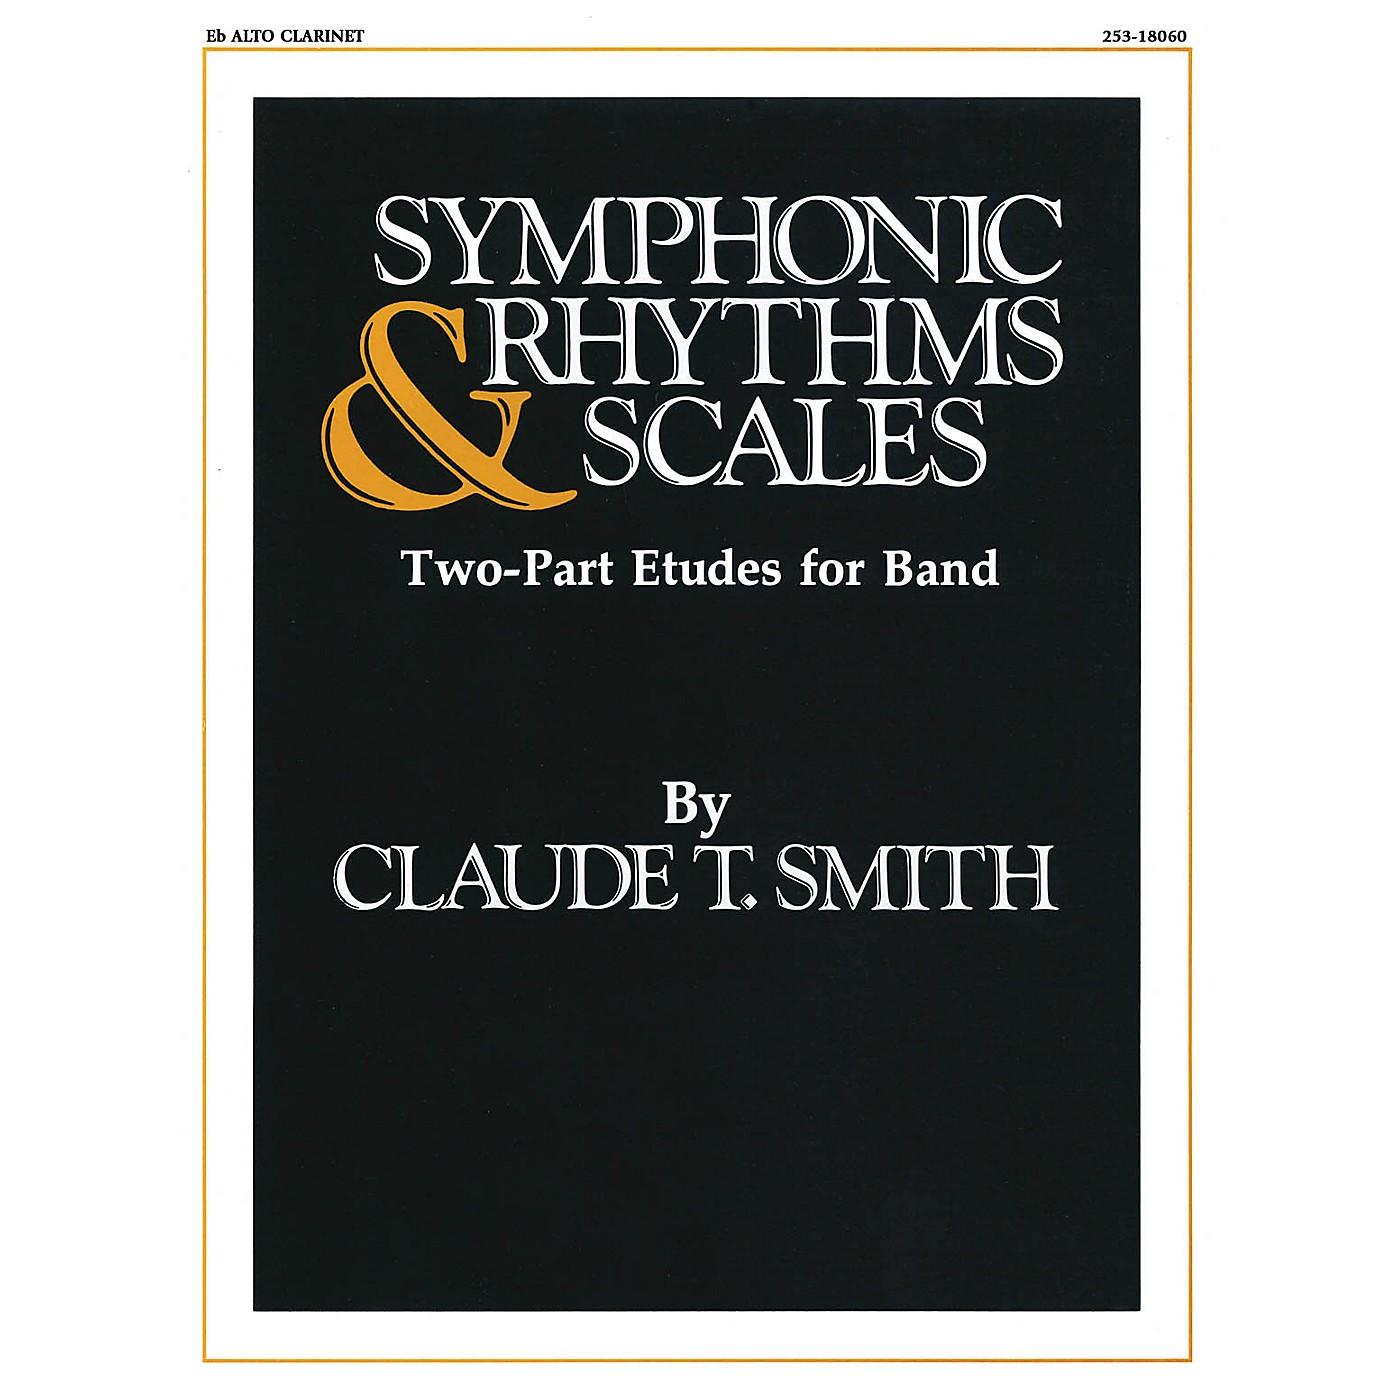 Hal Leonard Symphonic Rhythms & Scales Concert Band Level 2-4 thumbnail